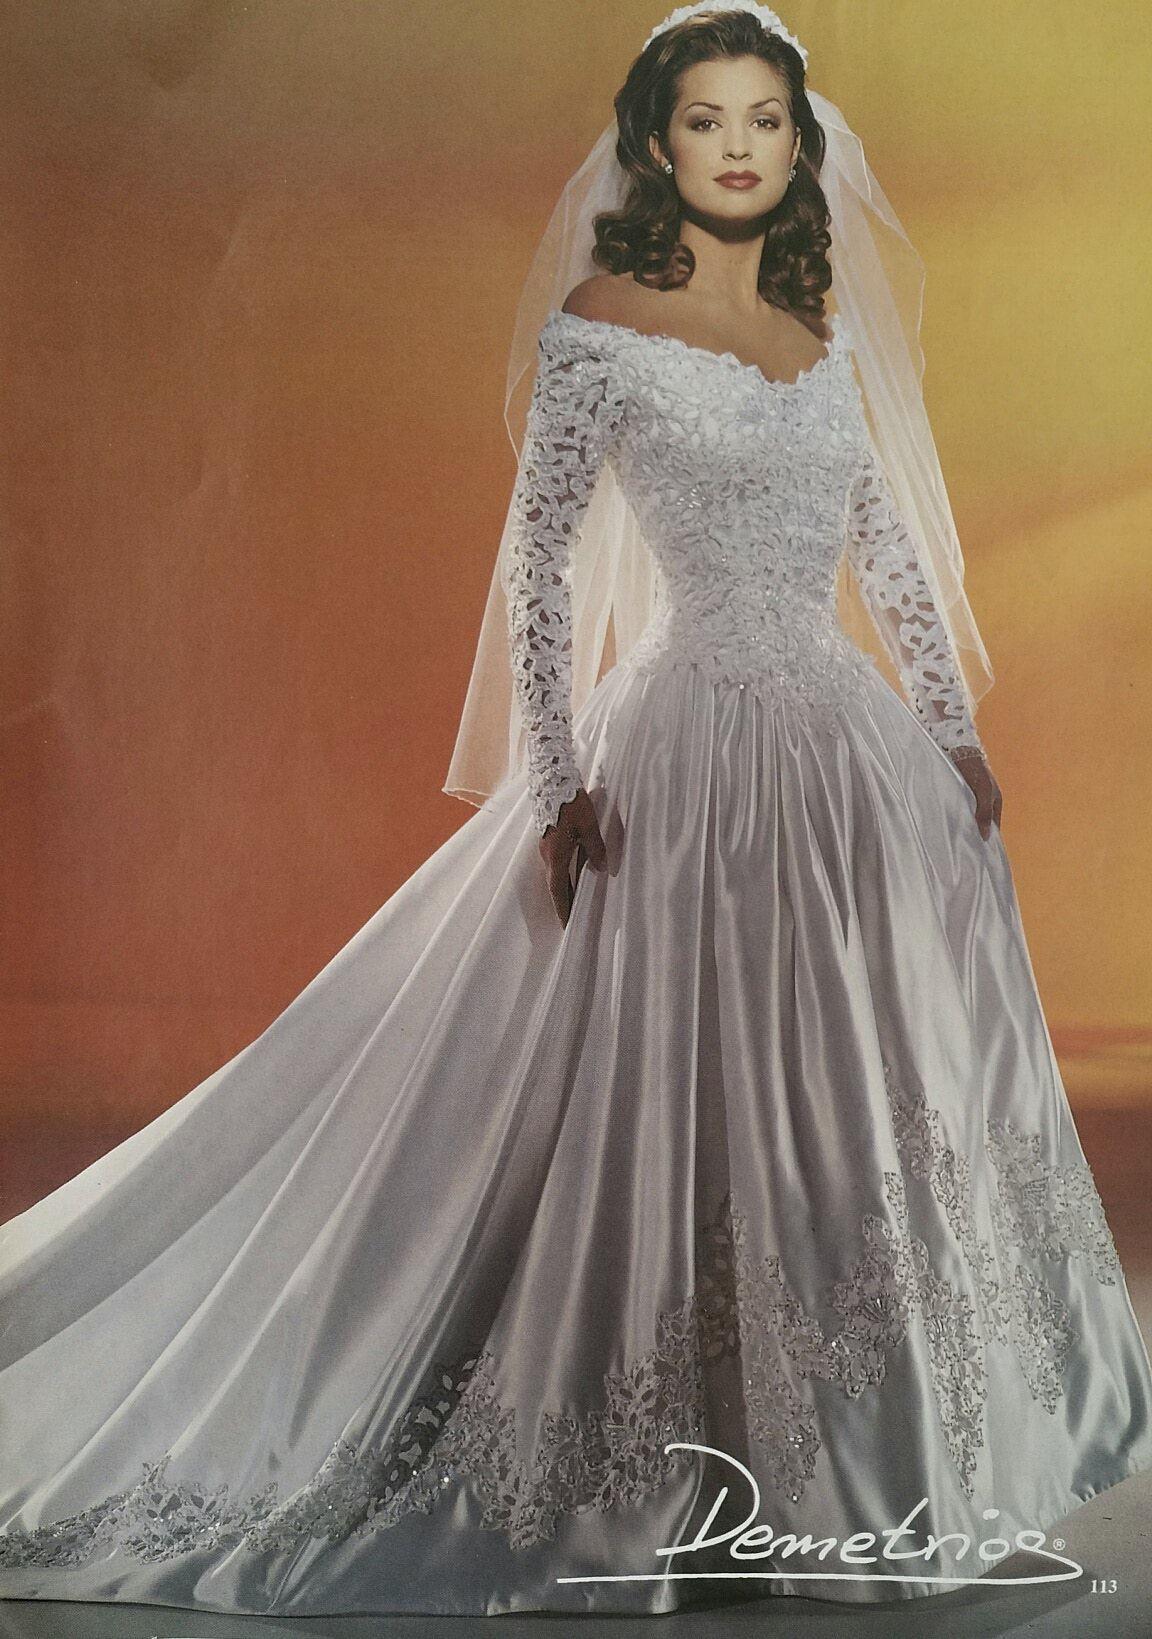 Demetrios Wedding Veils  Demetrios 1994 Demetrios 90 s collections